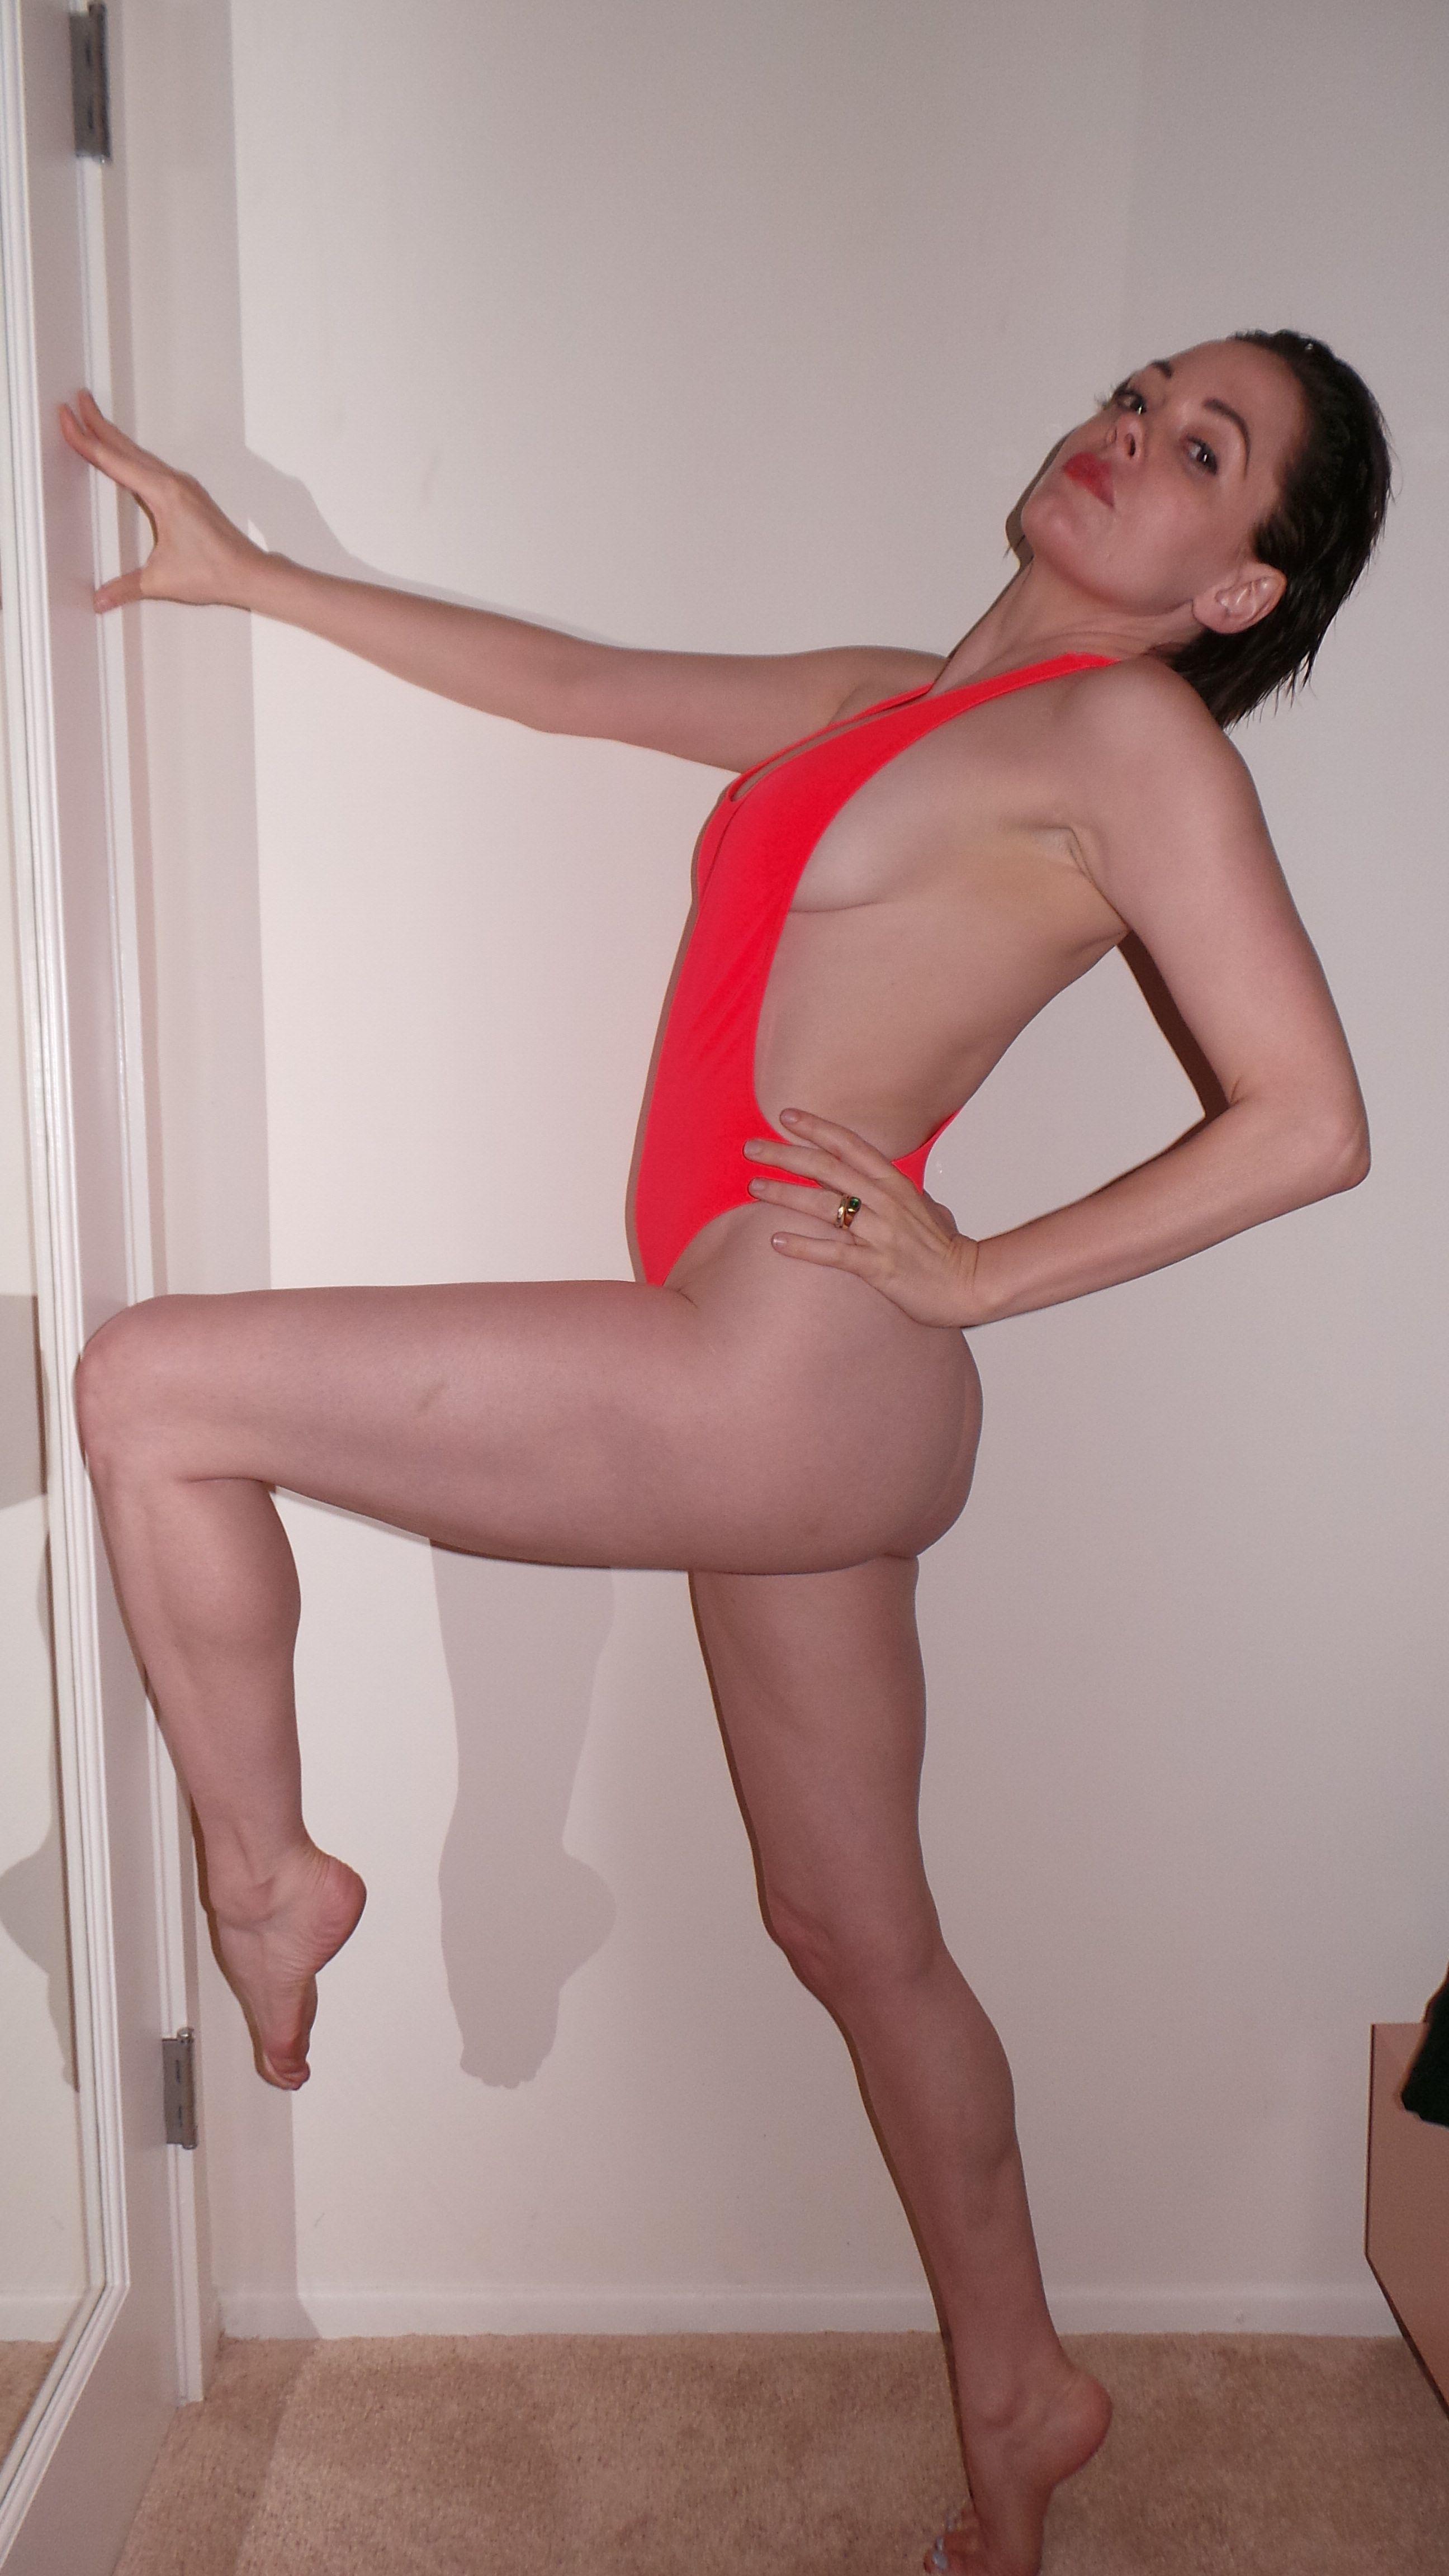 Rose-McGowan-nude-EDVAAK.jpg